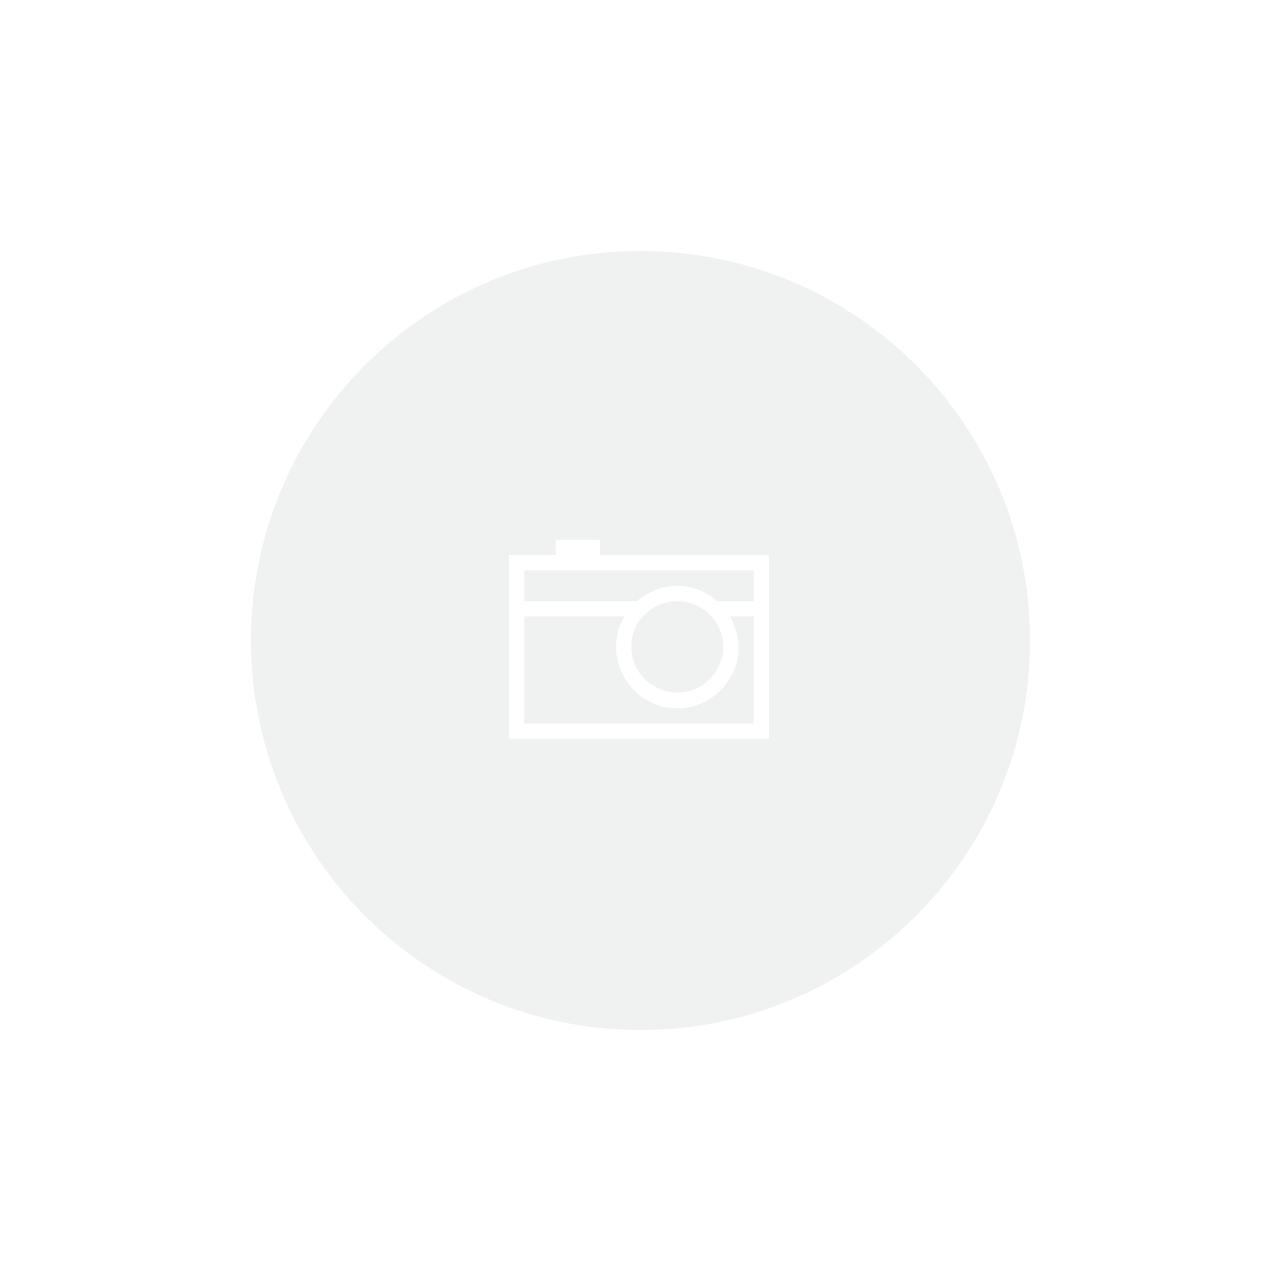 PEDAL 9/16 CLIP WELLGO MTB WPD823 COM TAQUINHO